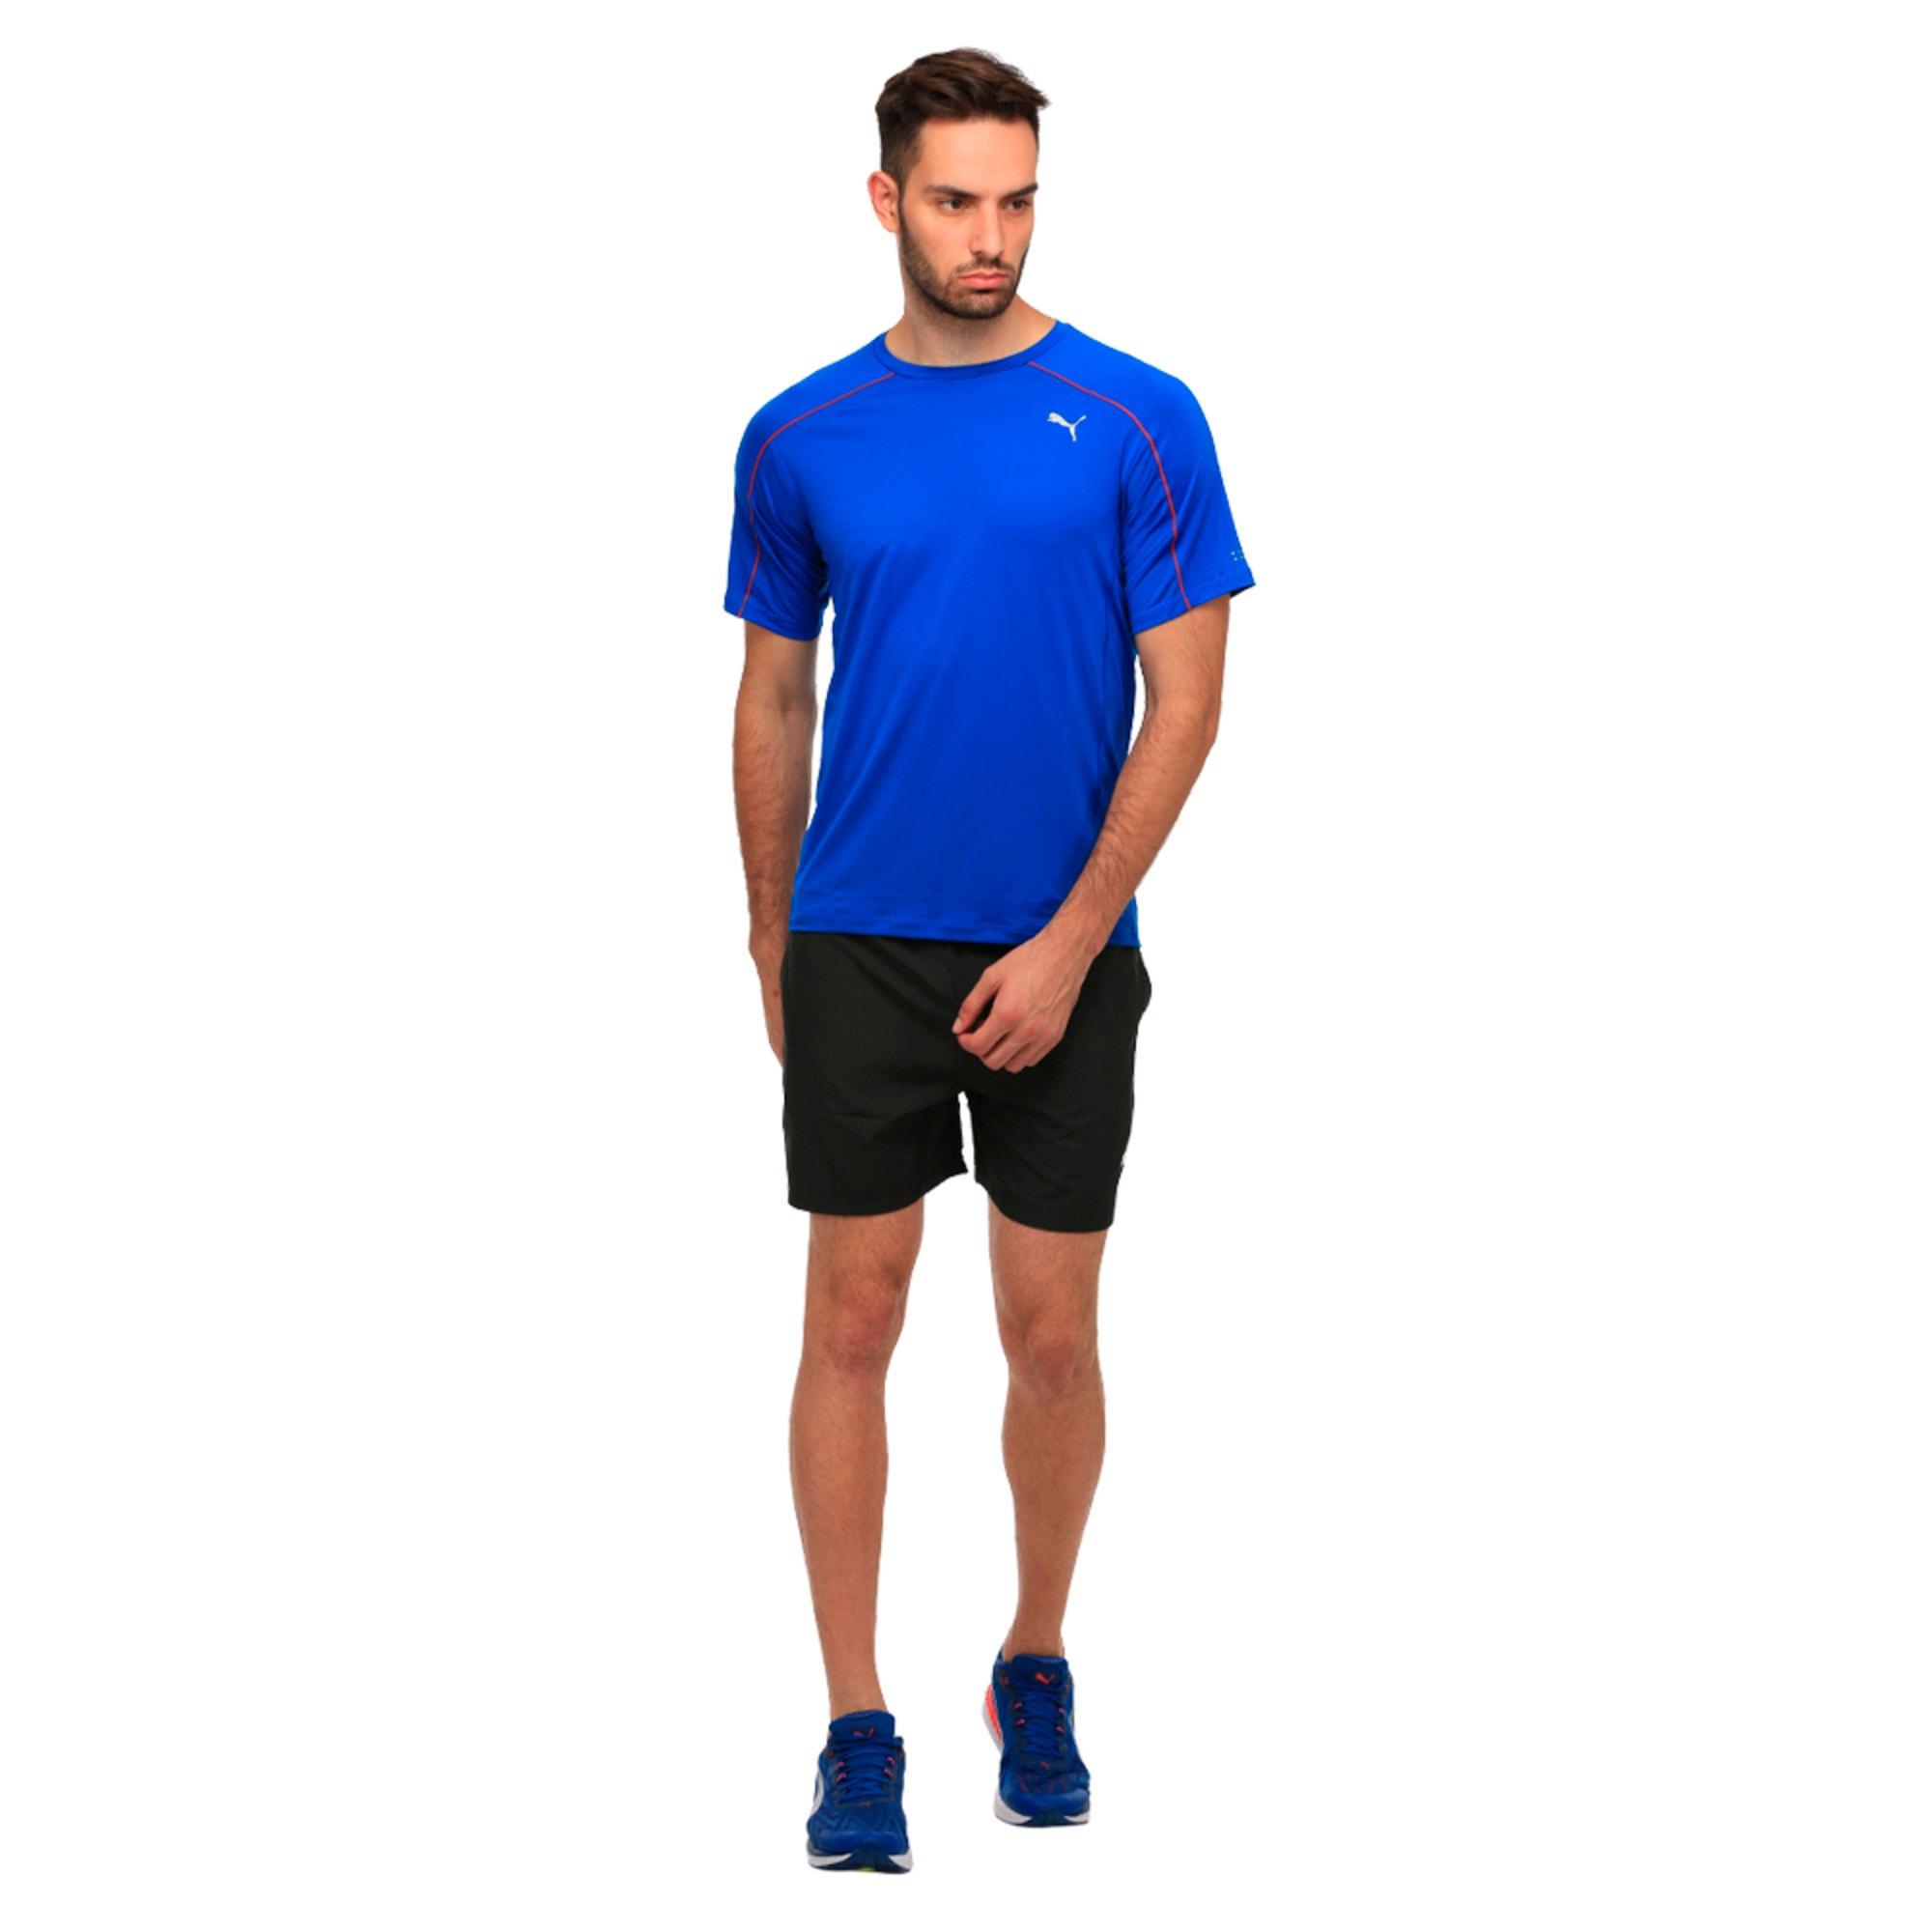 Thumbnail 3 of Running Men's Speed T-Shirt, Lapis Blue, medium-IND